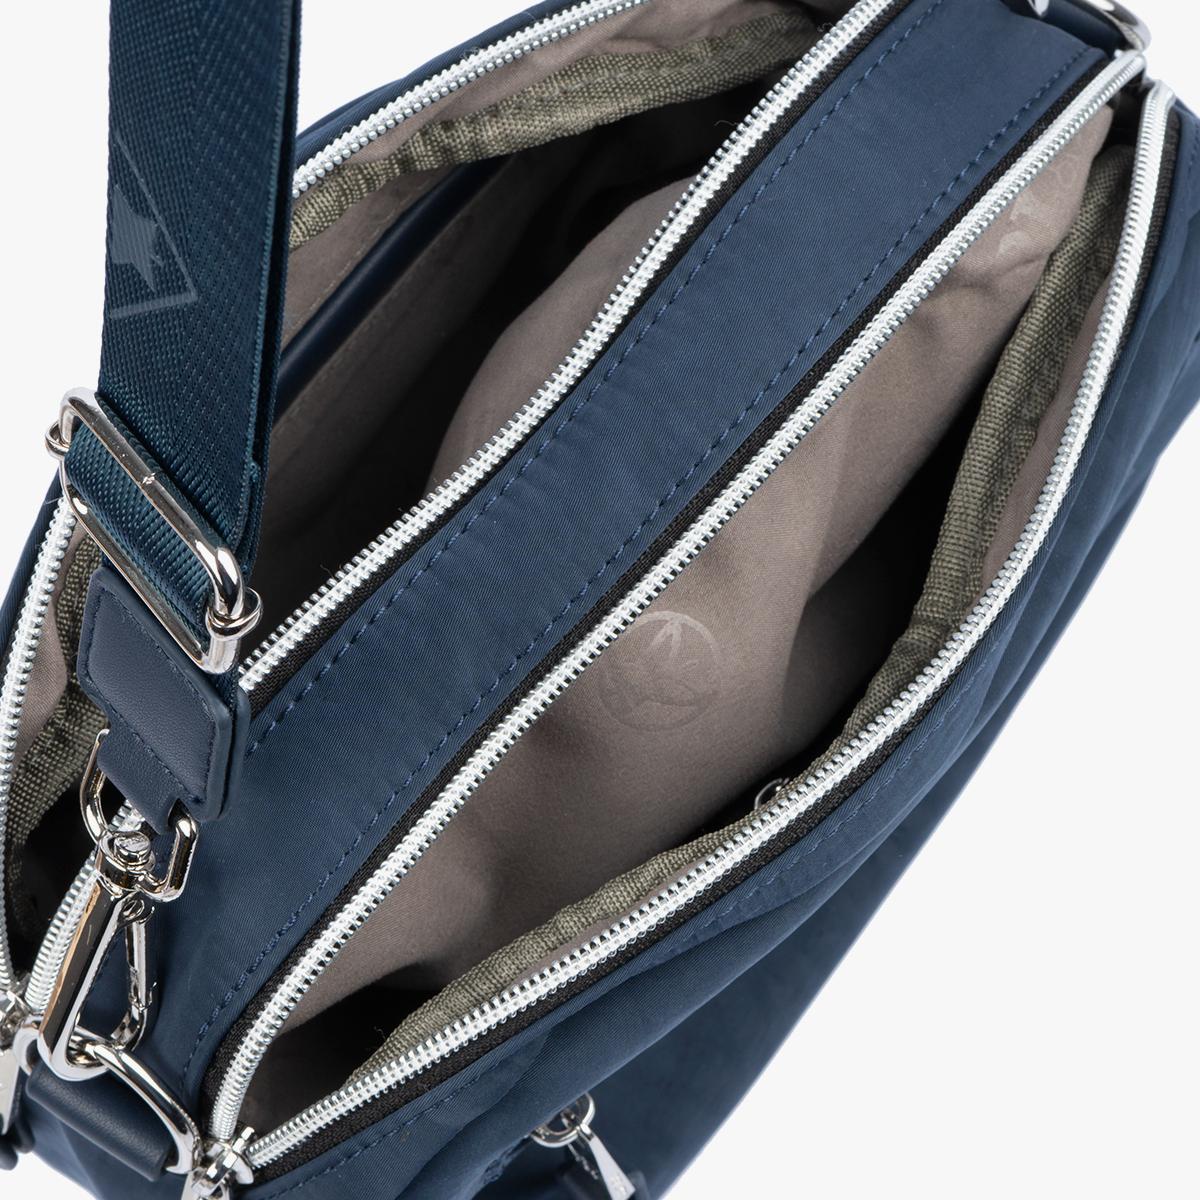 Bolso Bandolera azul 18215 bolsillo